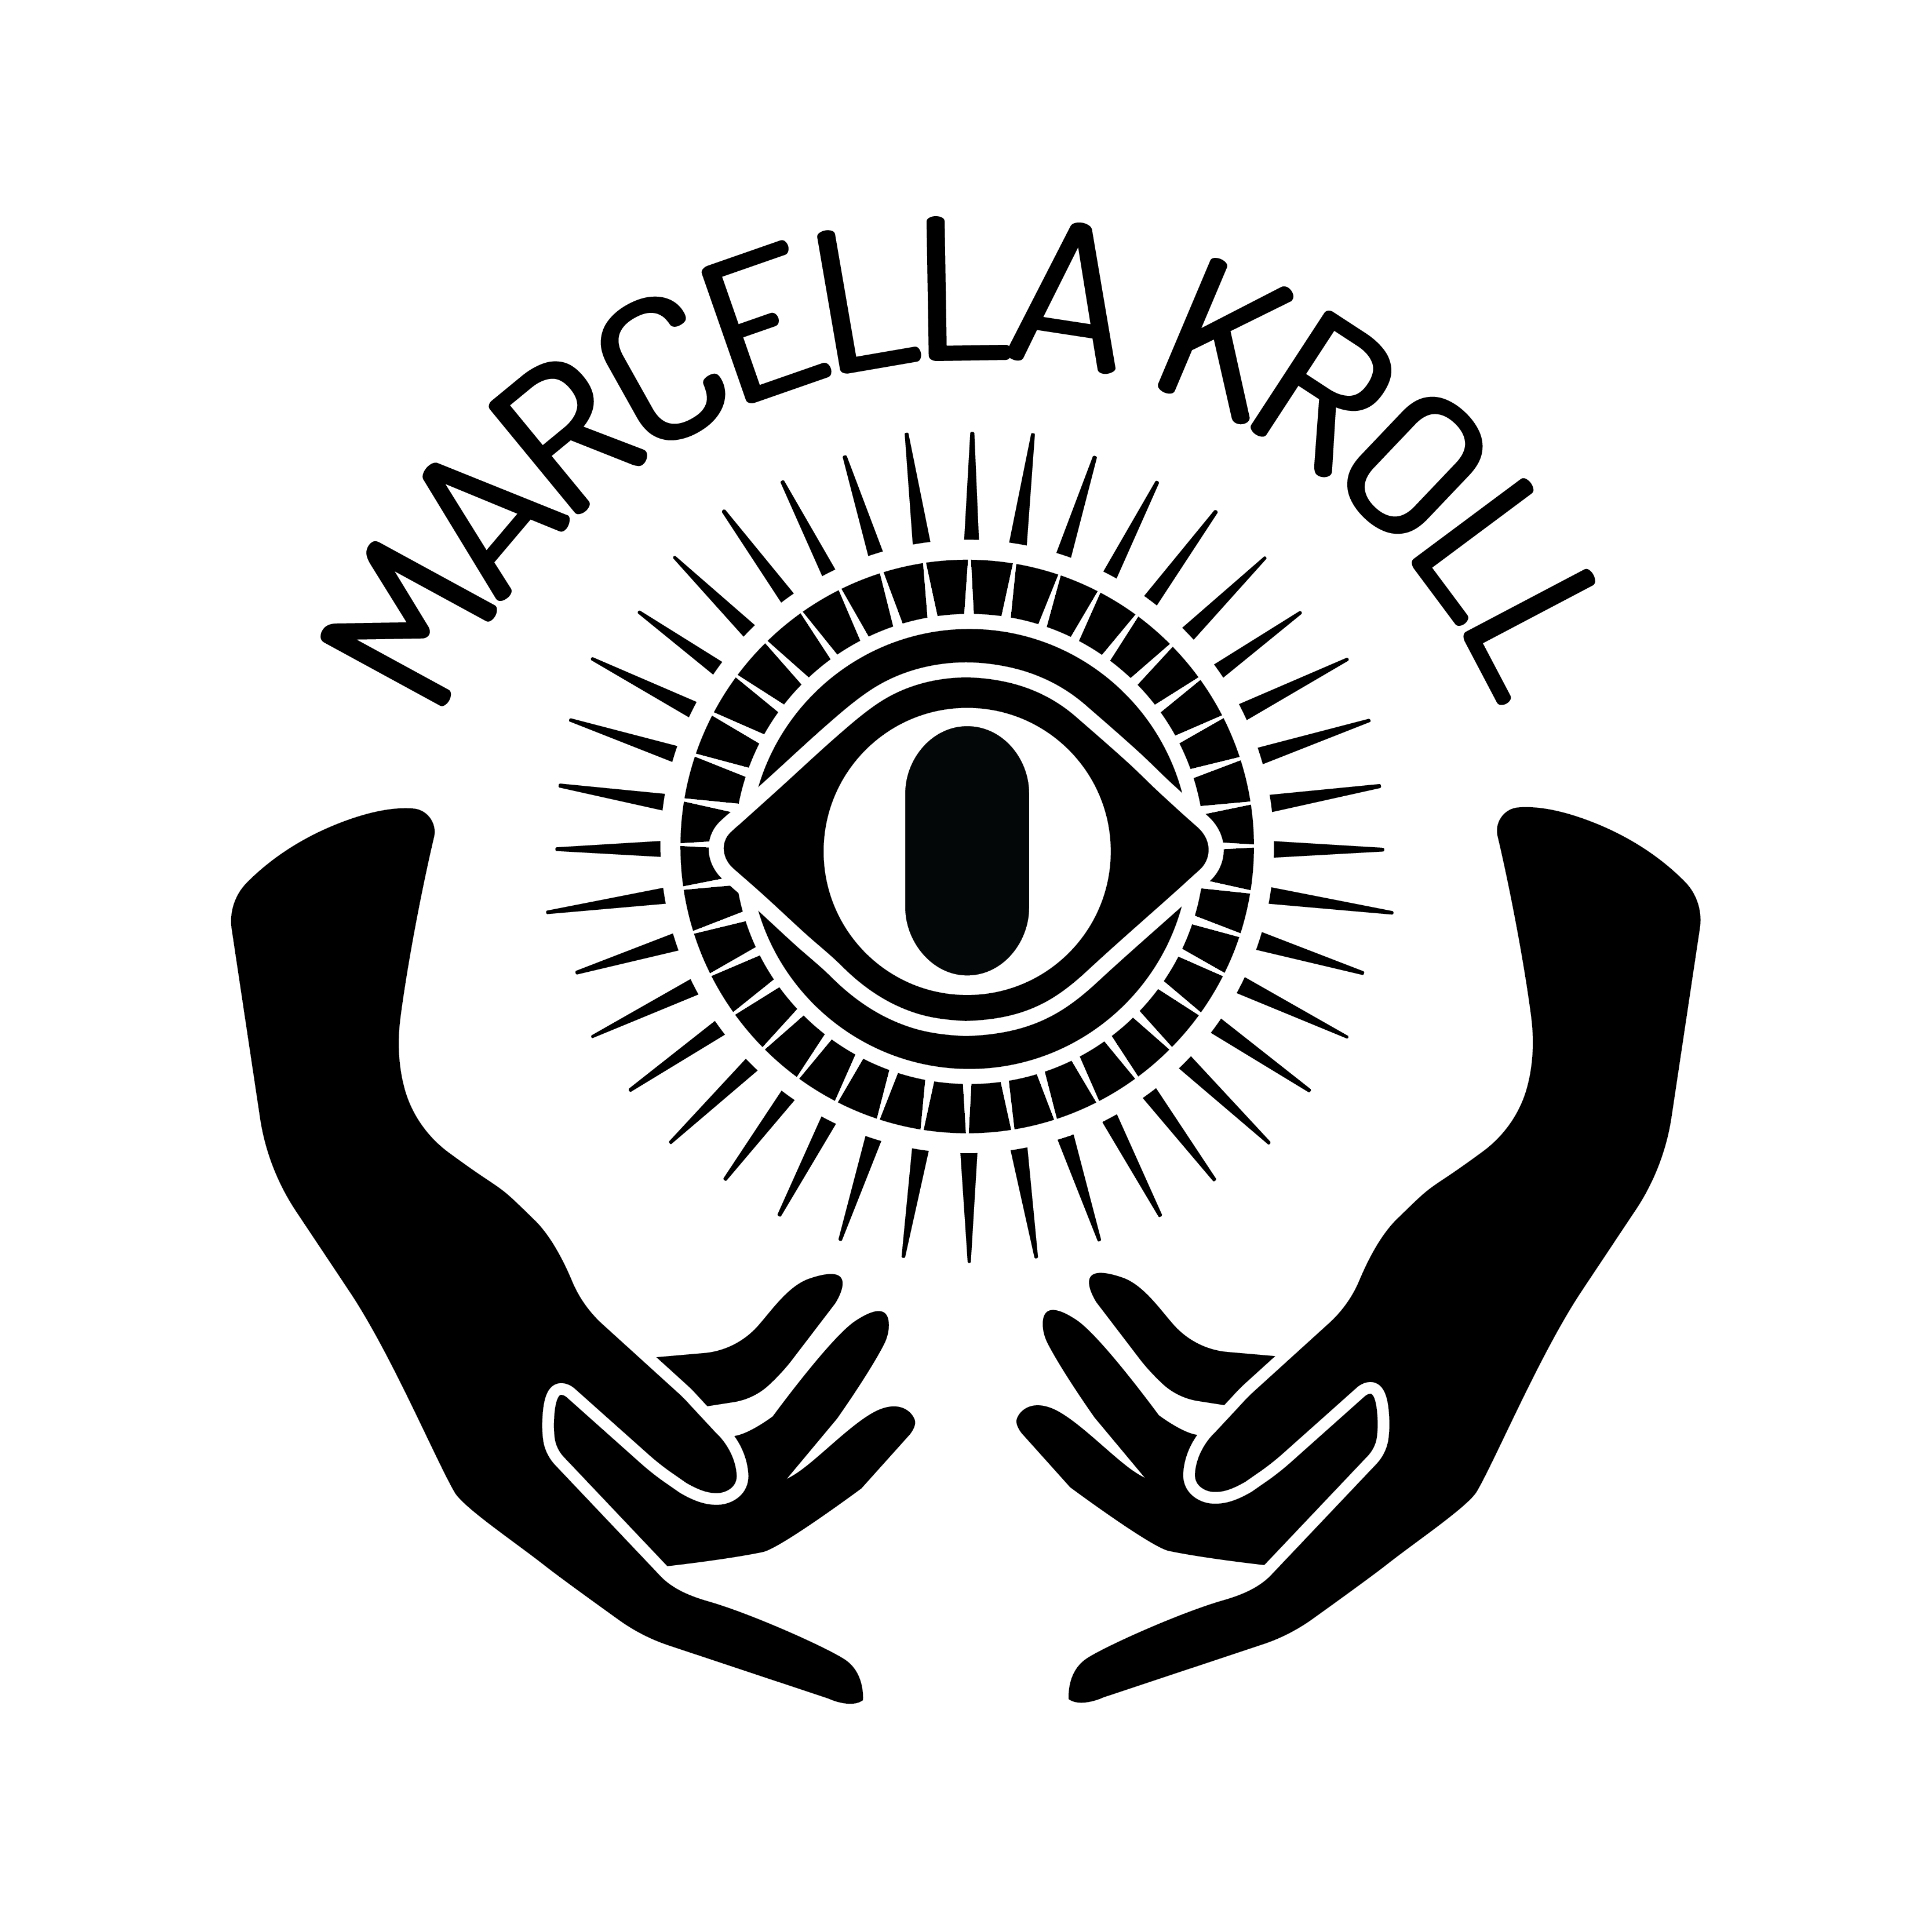 Marcella Kroll